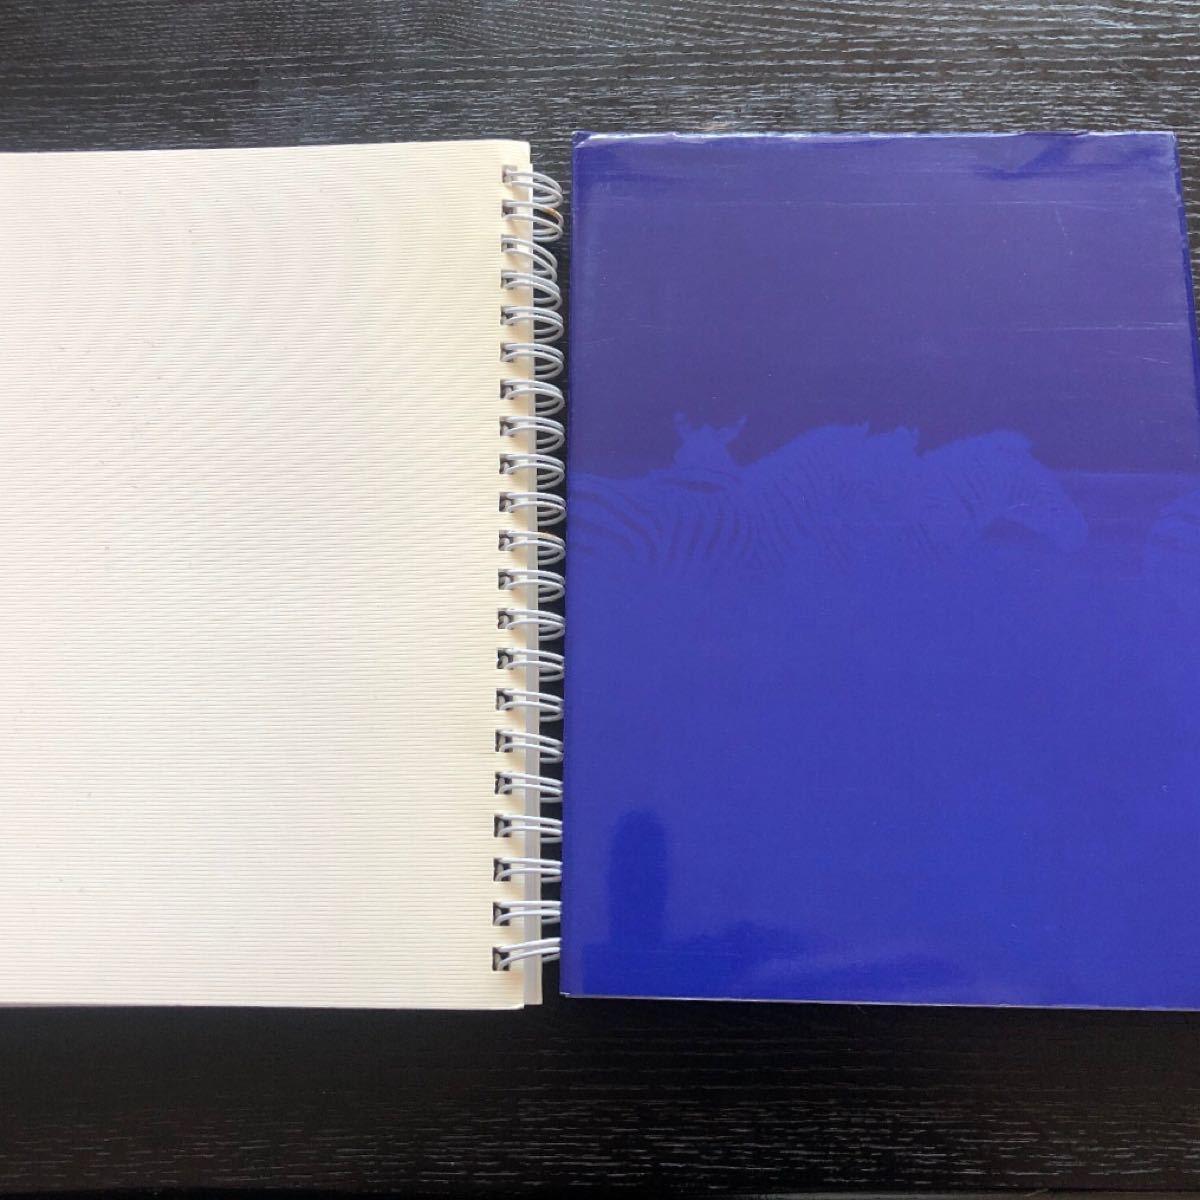 事典色彩自由自在 : Color creation 事典編